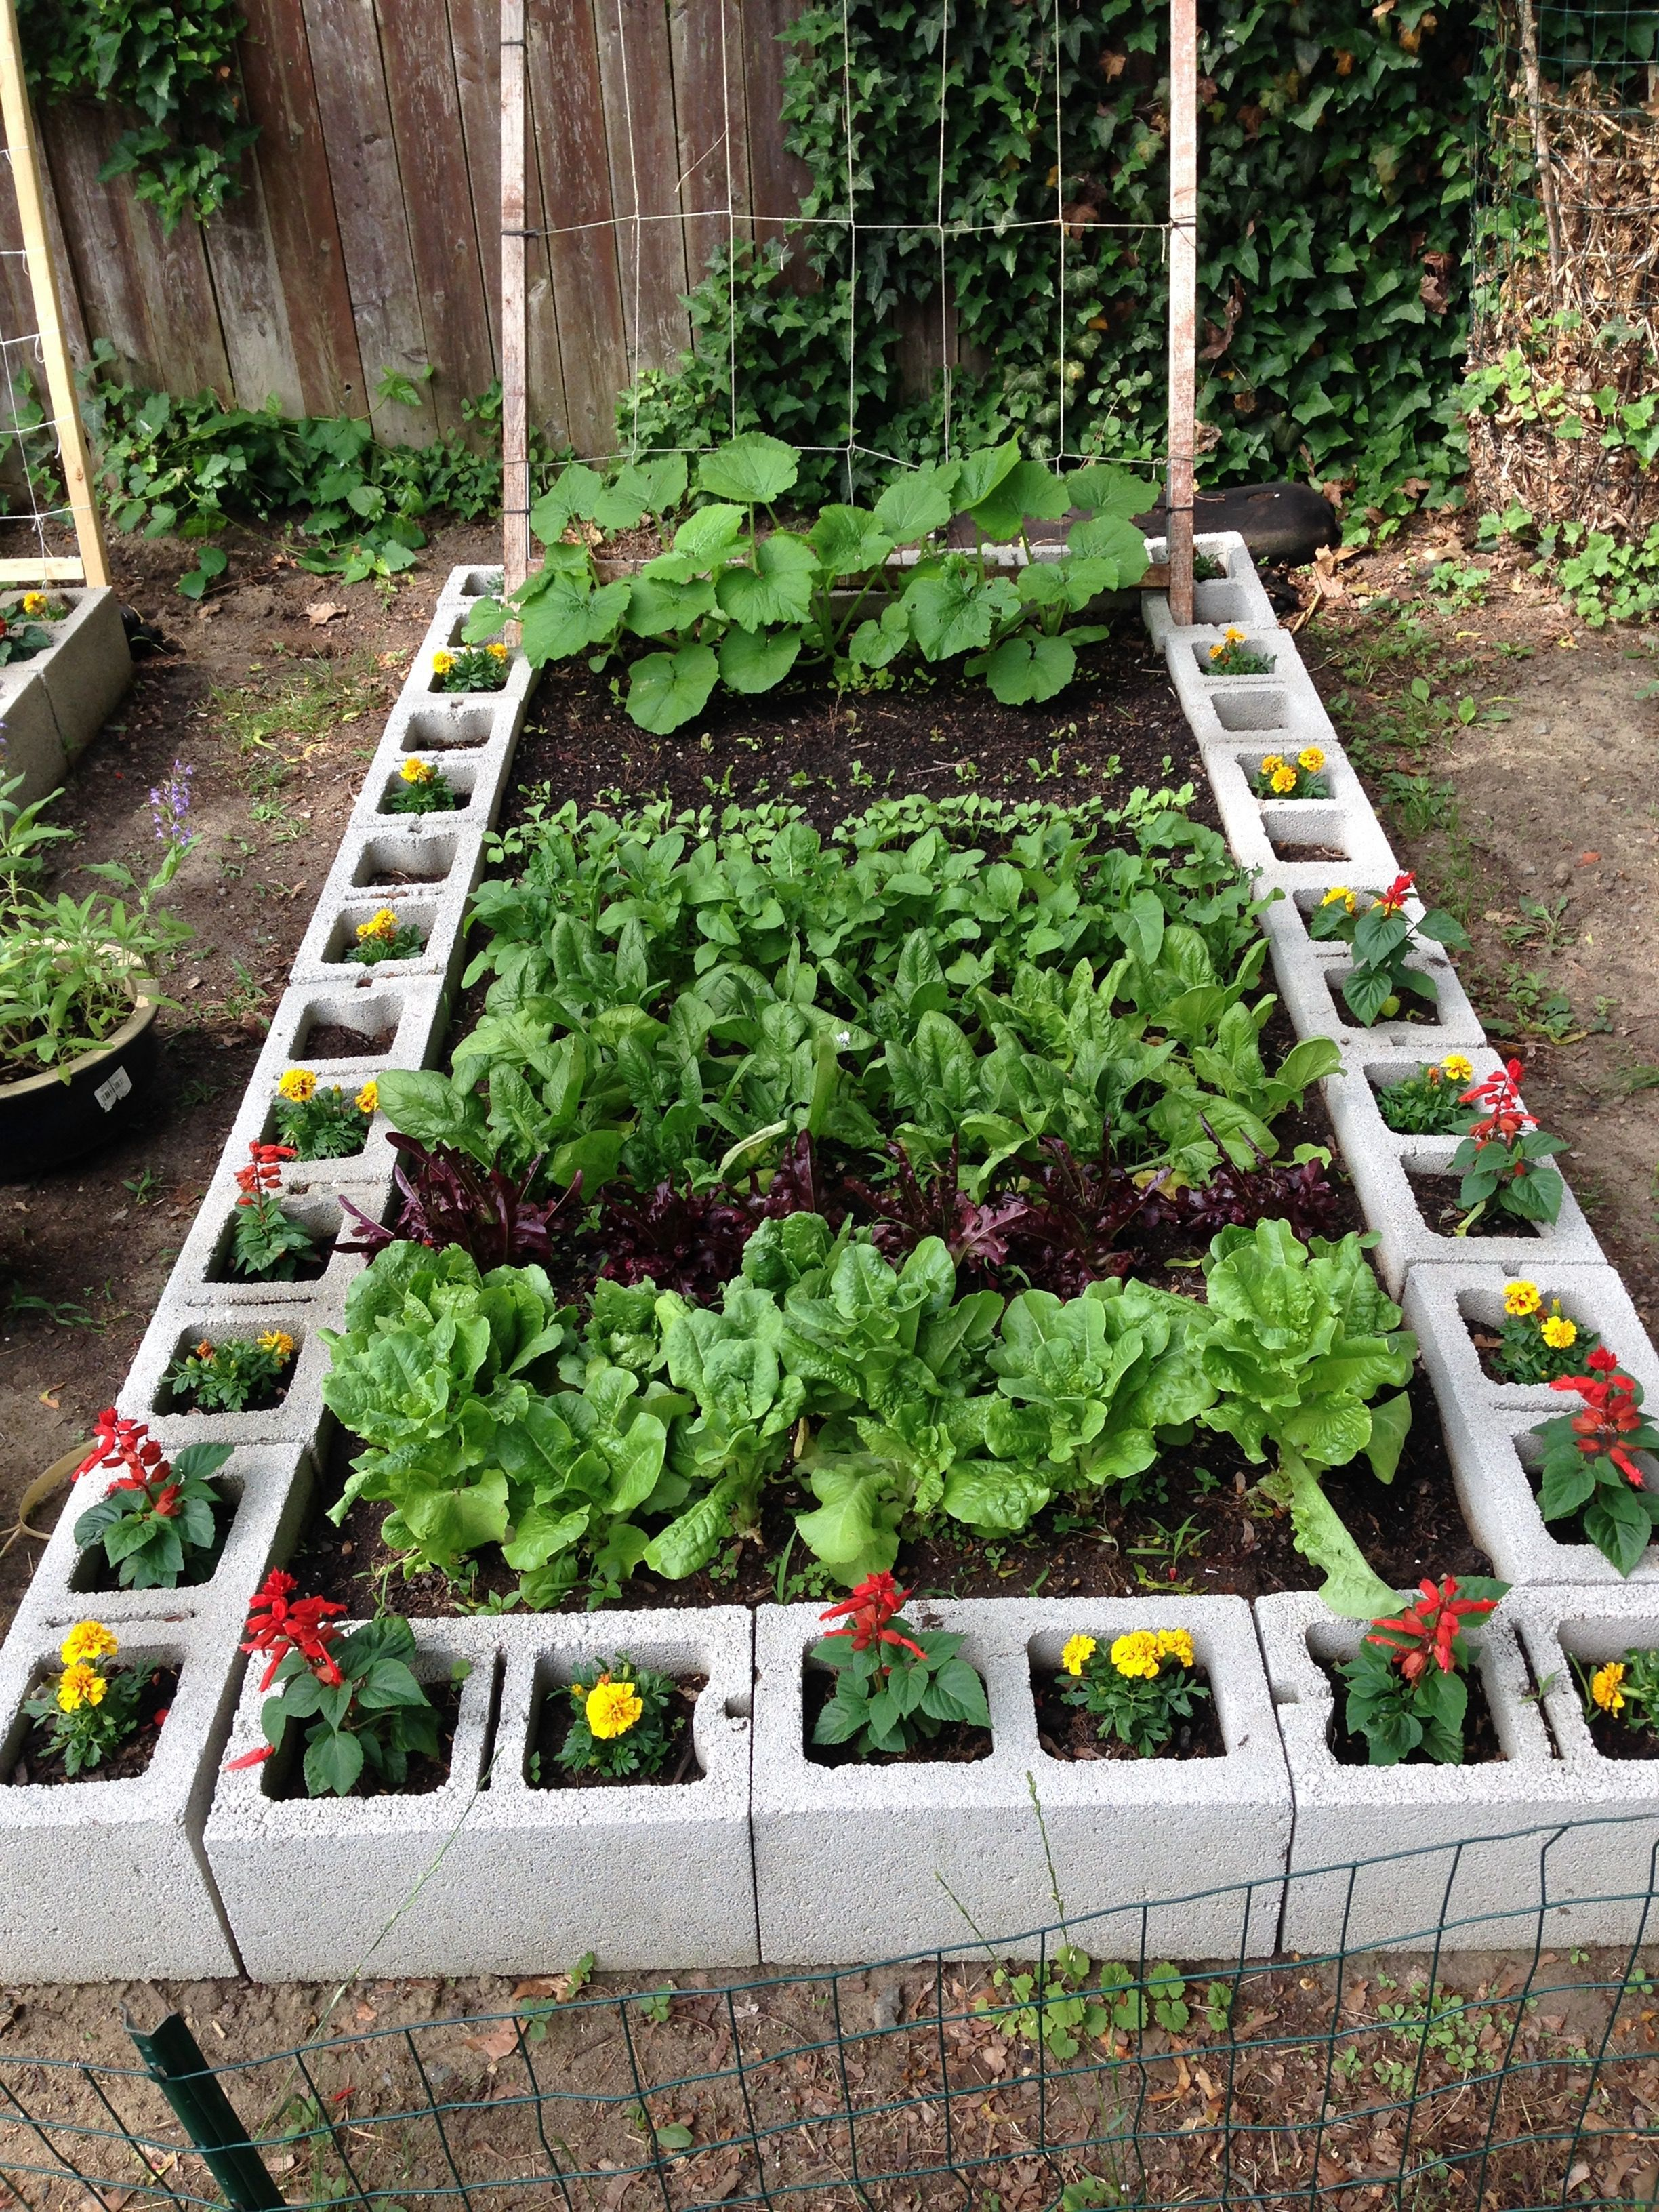 Gorgeous 10 Diy Vegetable Garden Ideas For Beginner Vegetable Garden Beds Raised Garden Bed Plans Diy Raised Garden Backyard vegetable garden ideas diy